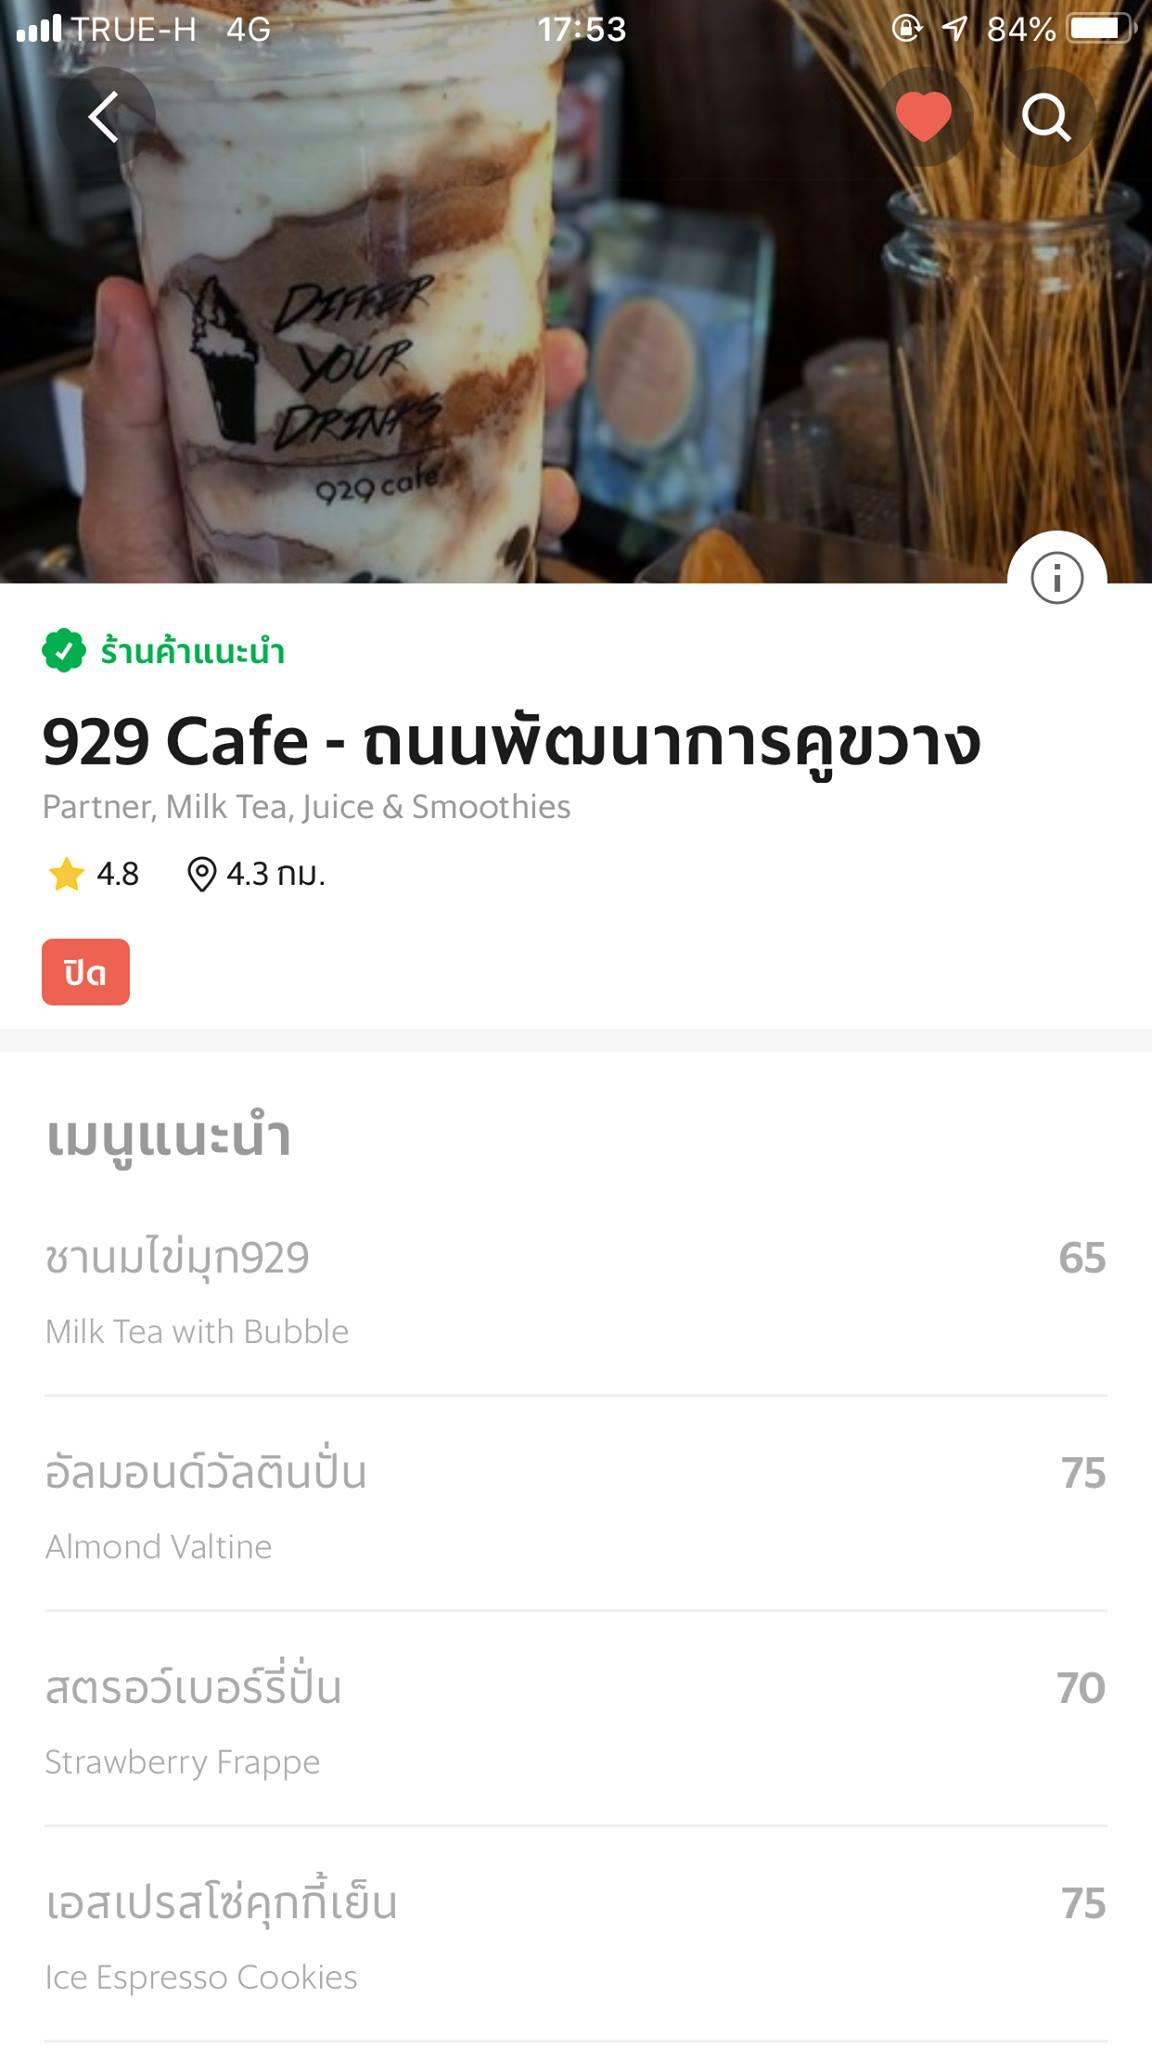 2. 929 Cafe ร้านเด็ดร้านดังด้วยเมนูยอดฮิต ชานมไข่มุก 929 ที่เรียกได้ว่าเดอะเบสจริงๆสำหรับนย่านนี้ อิอิgrabfood,อร่อย,ของกิน,นครศรี,Delivery